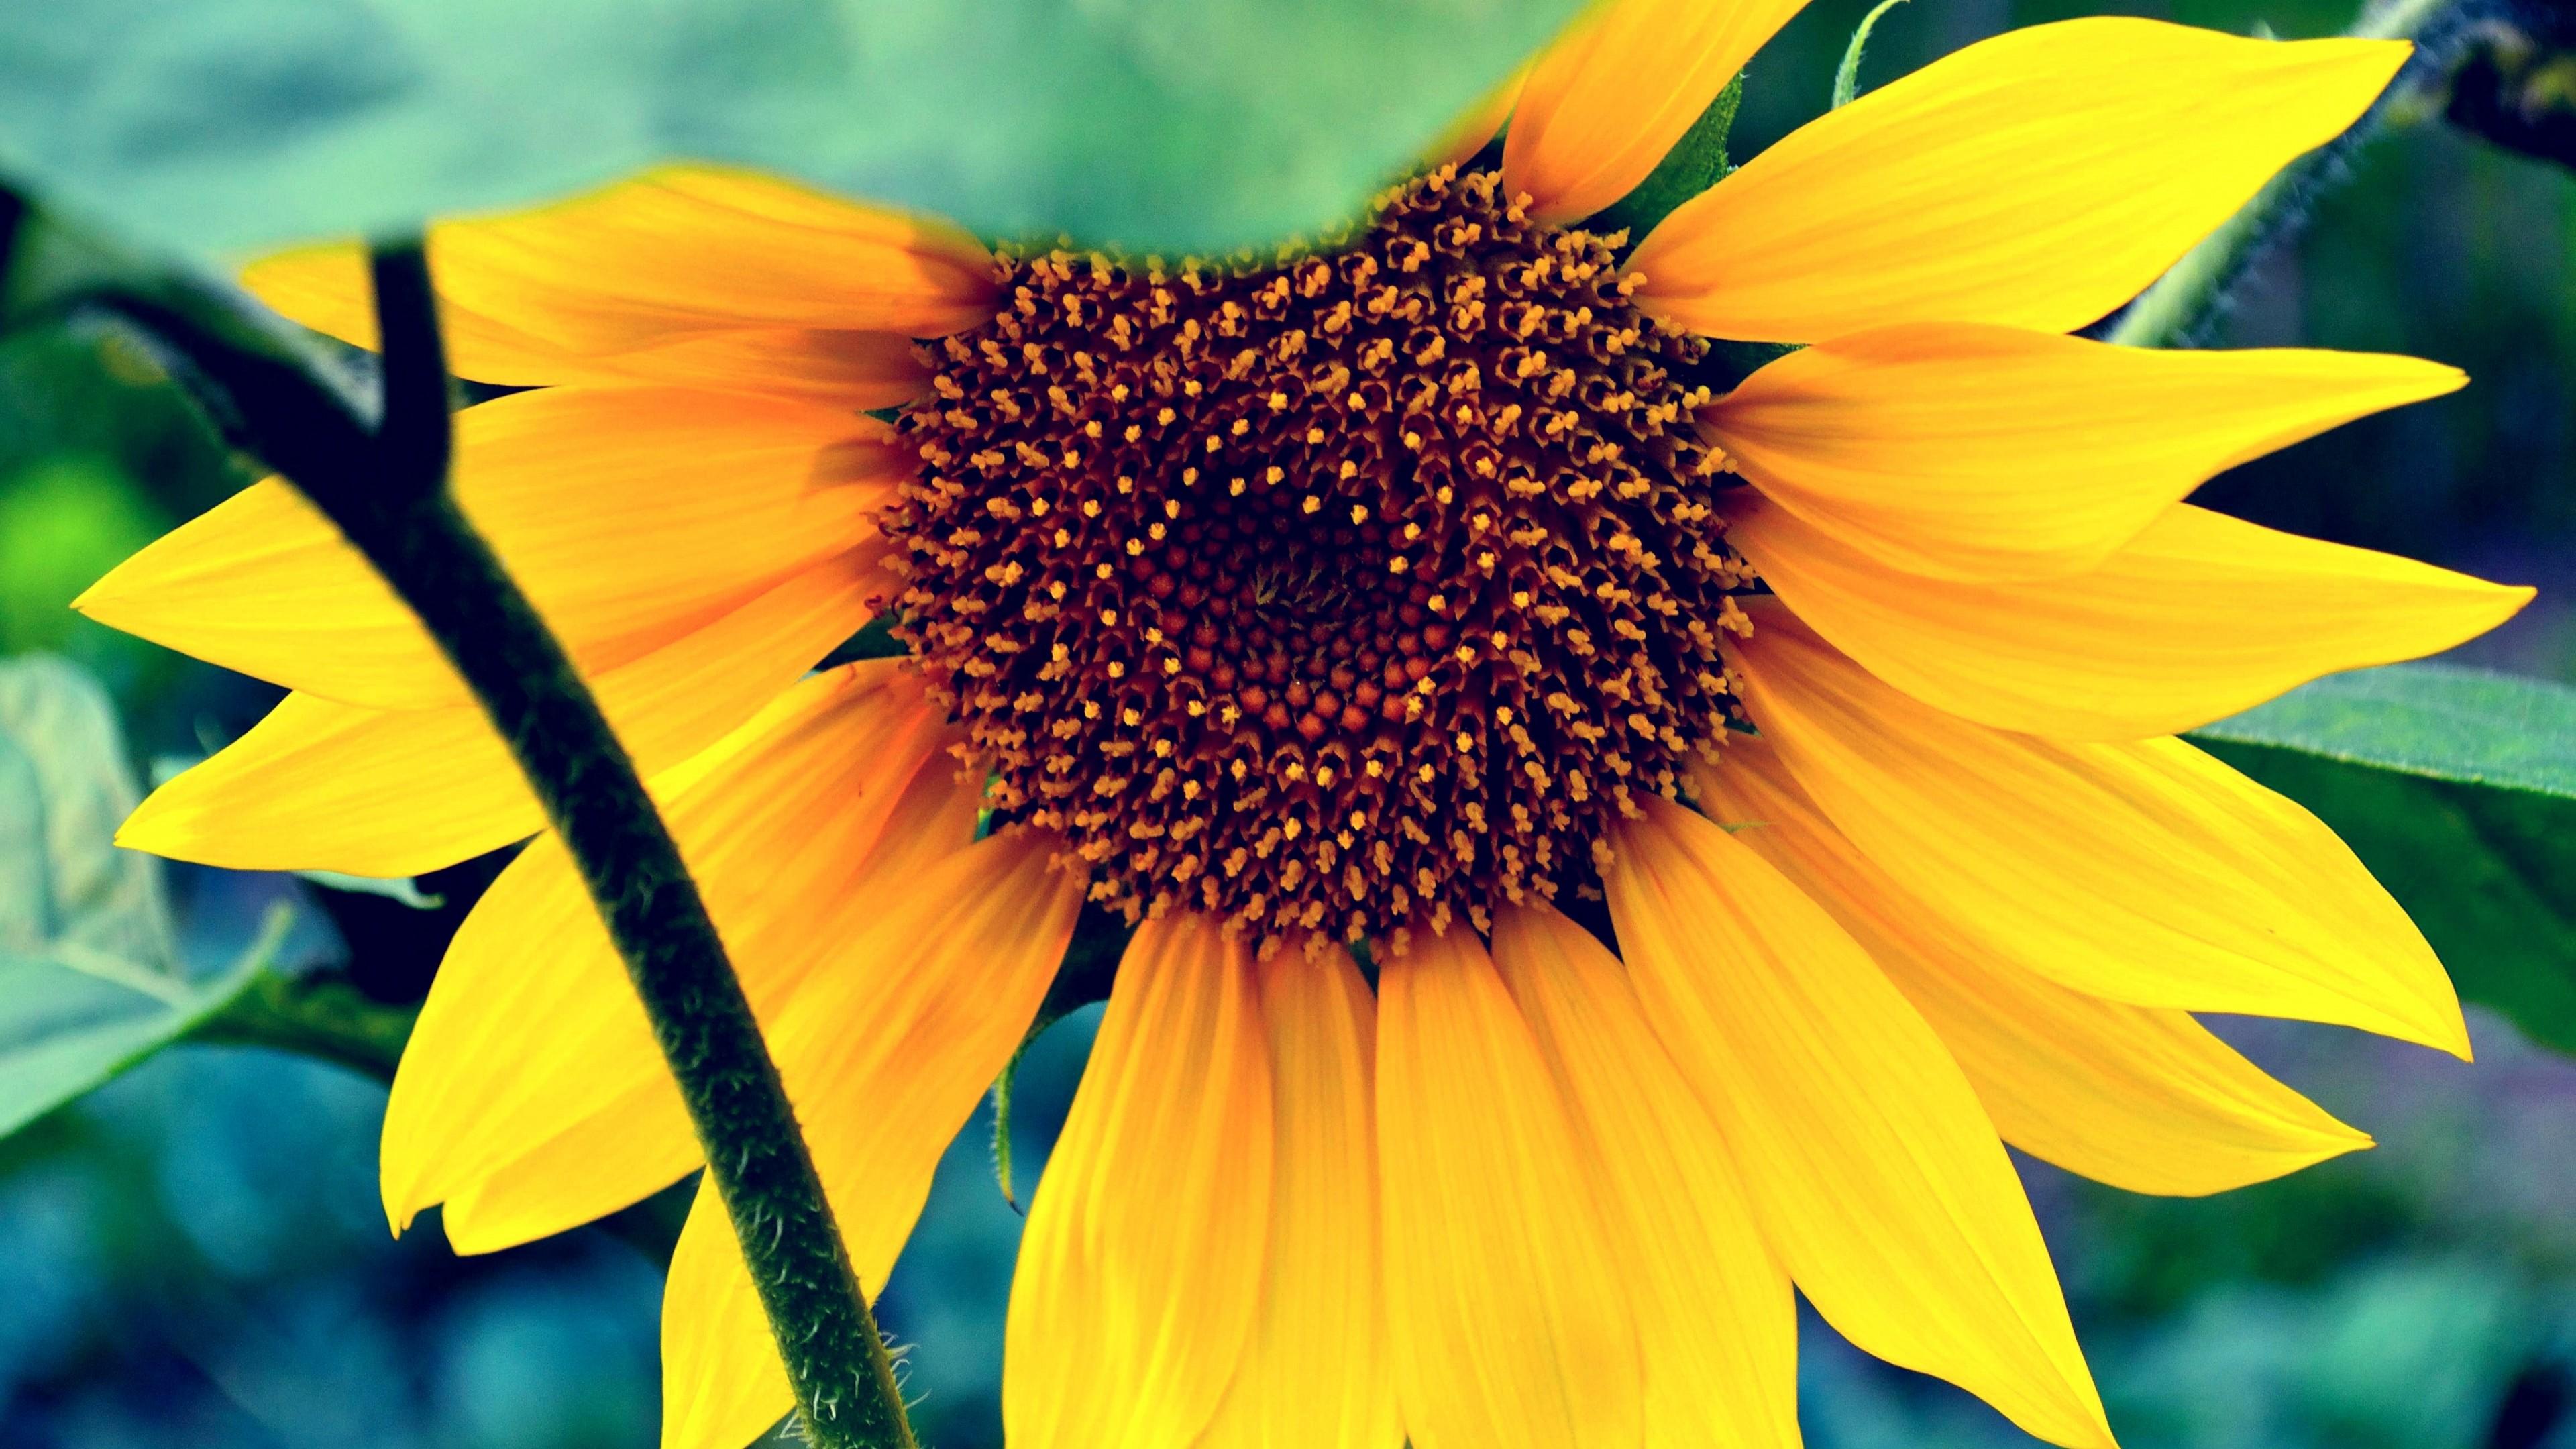 Wallpaper Sunflower Hd 4k Wallpaper Macro Flowers Yellow Os 5325 Page 138